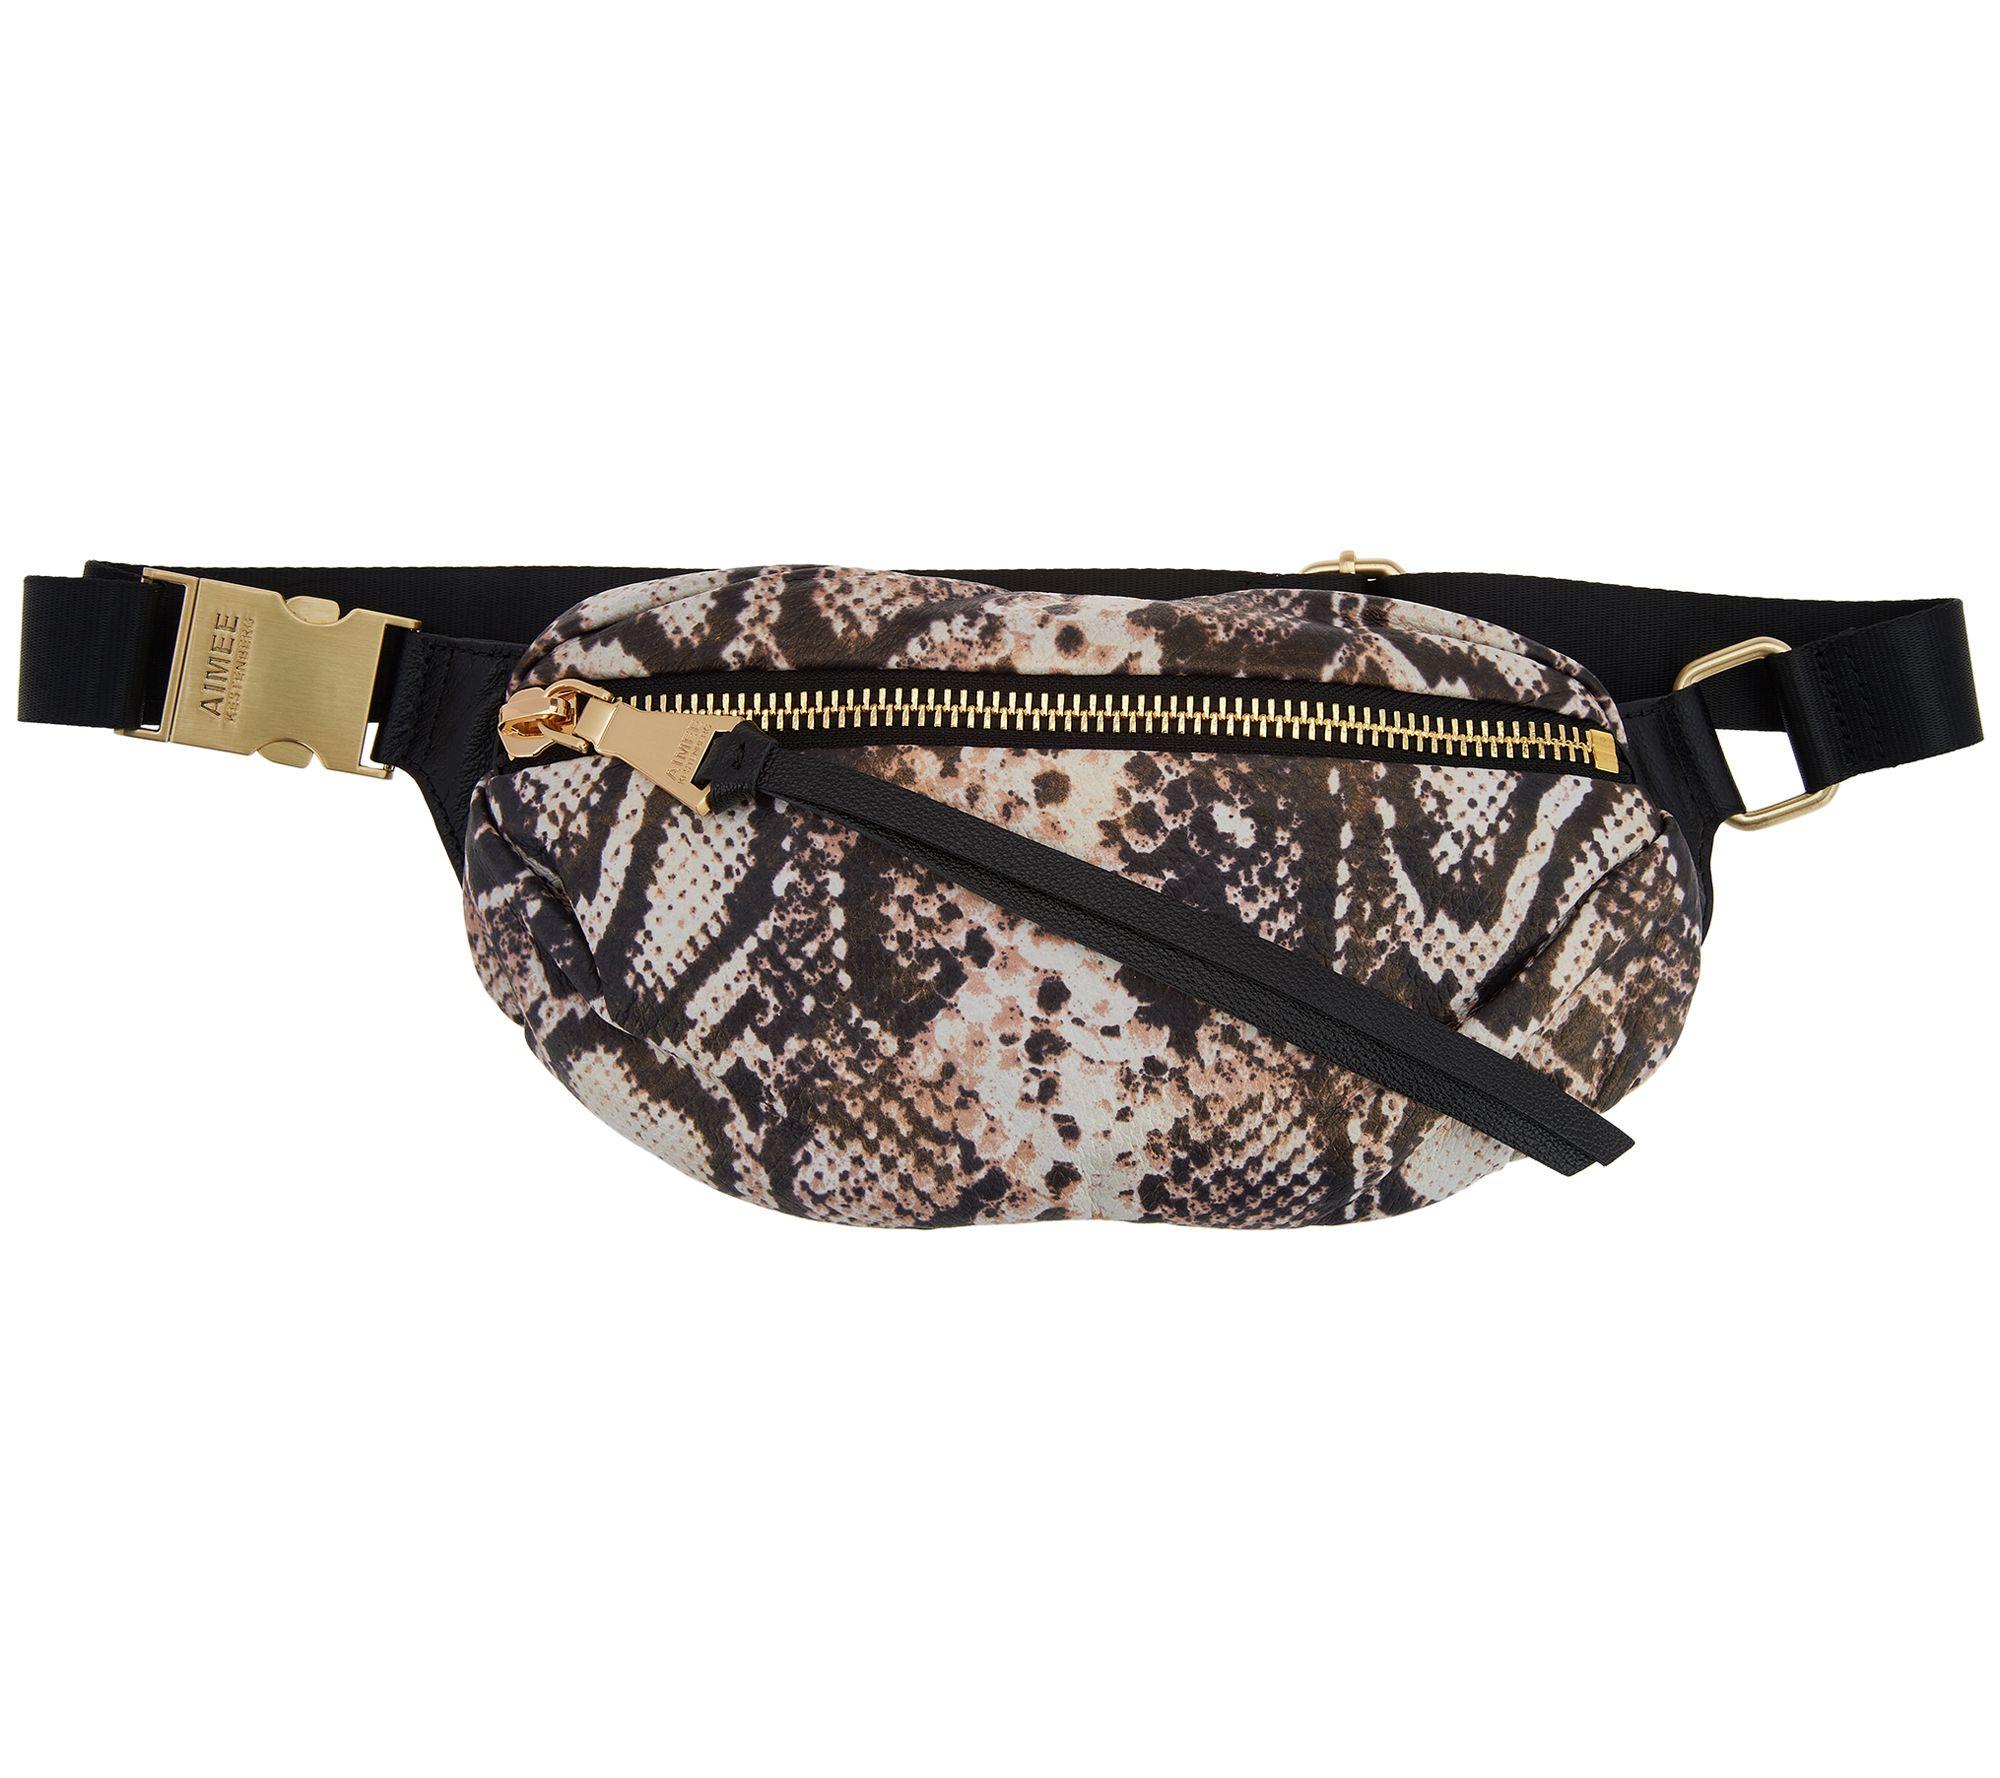 Fanny Pack Stealth Travel bum Bags Running Pocket For Men Women Waist Bag Save The Sharks